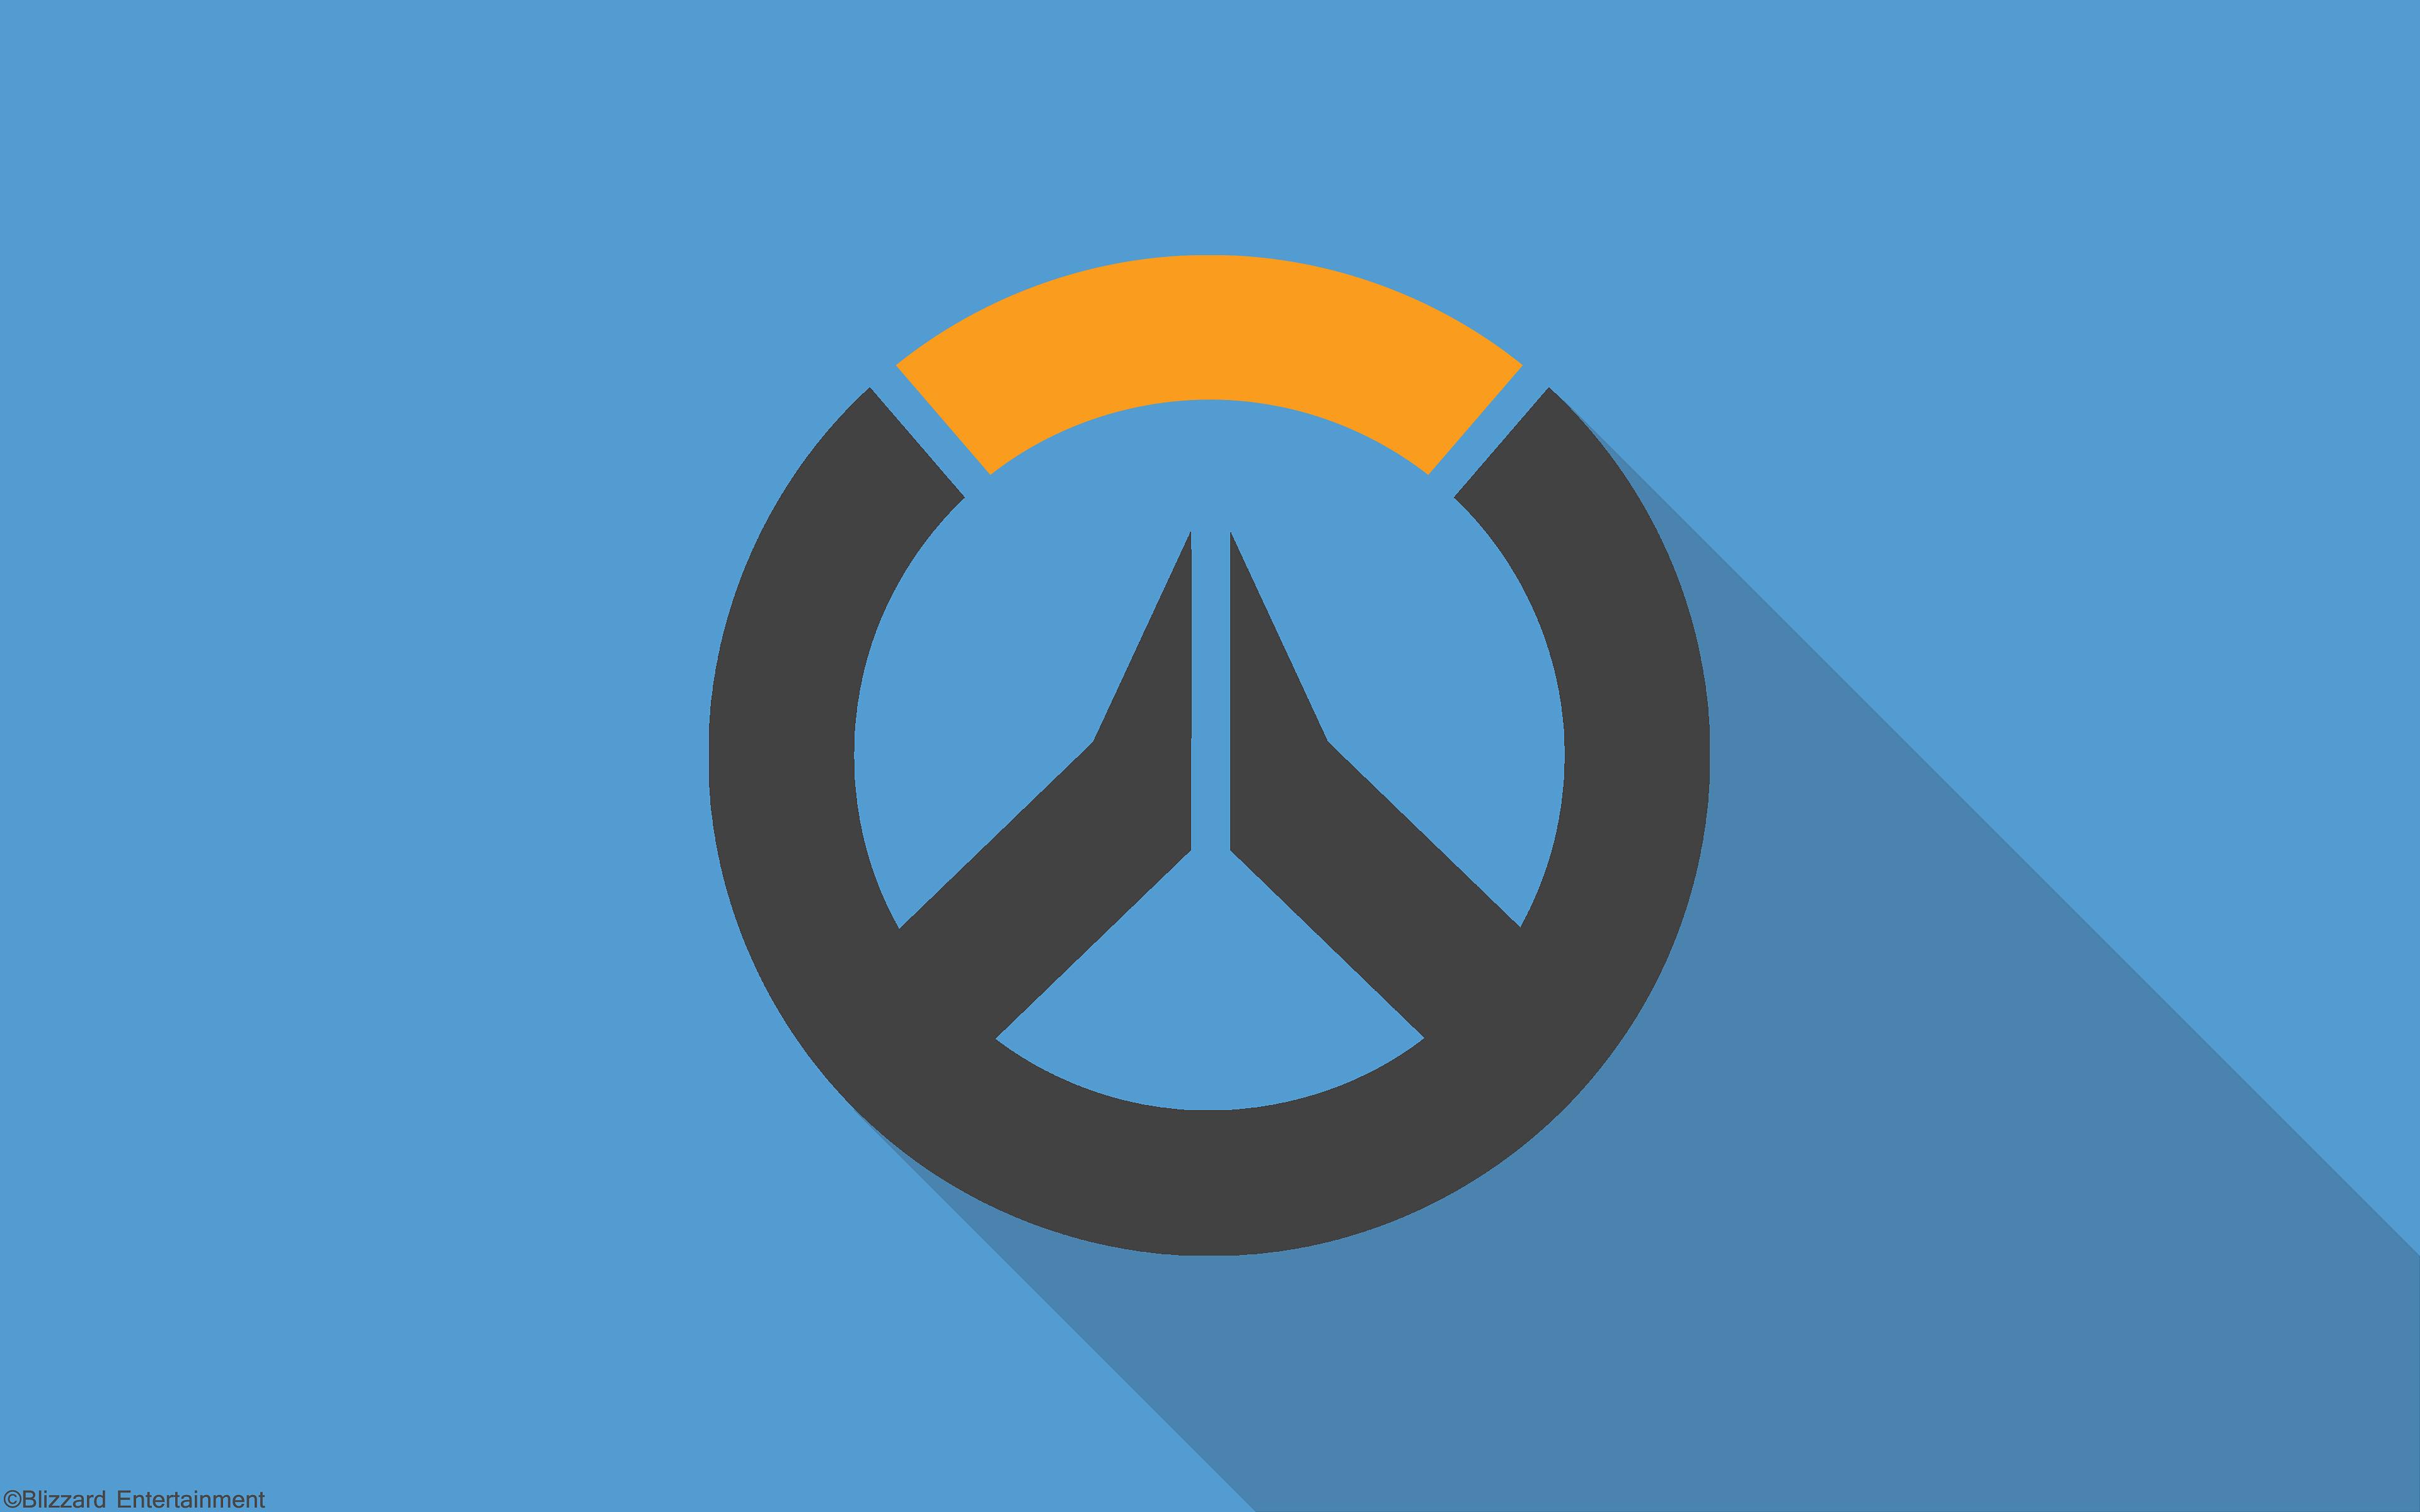 Overwatch material design logo hd games 4k wallpapers for Material design wallpaper 4k